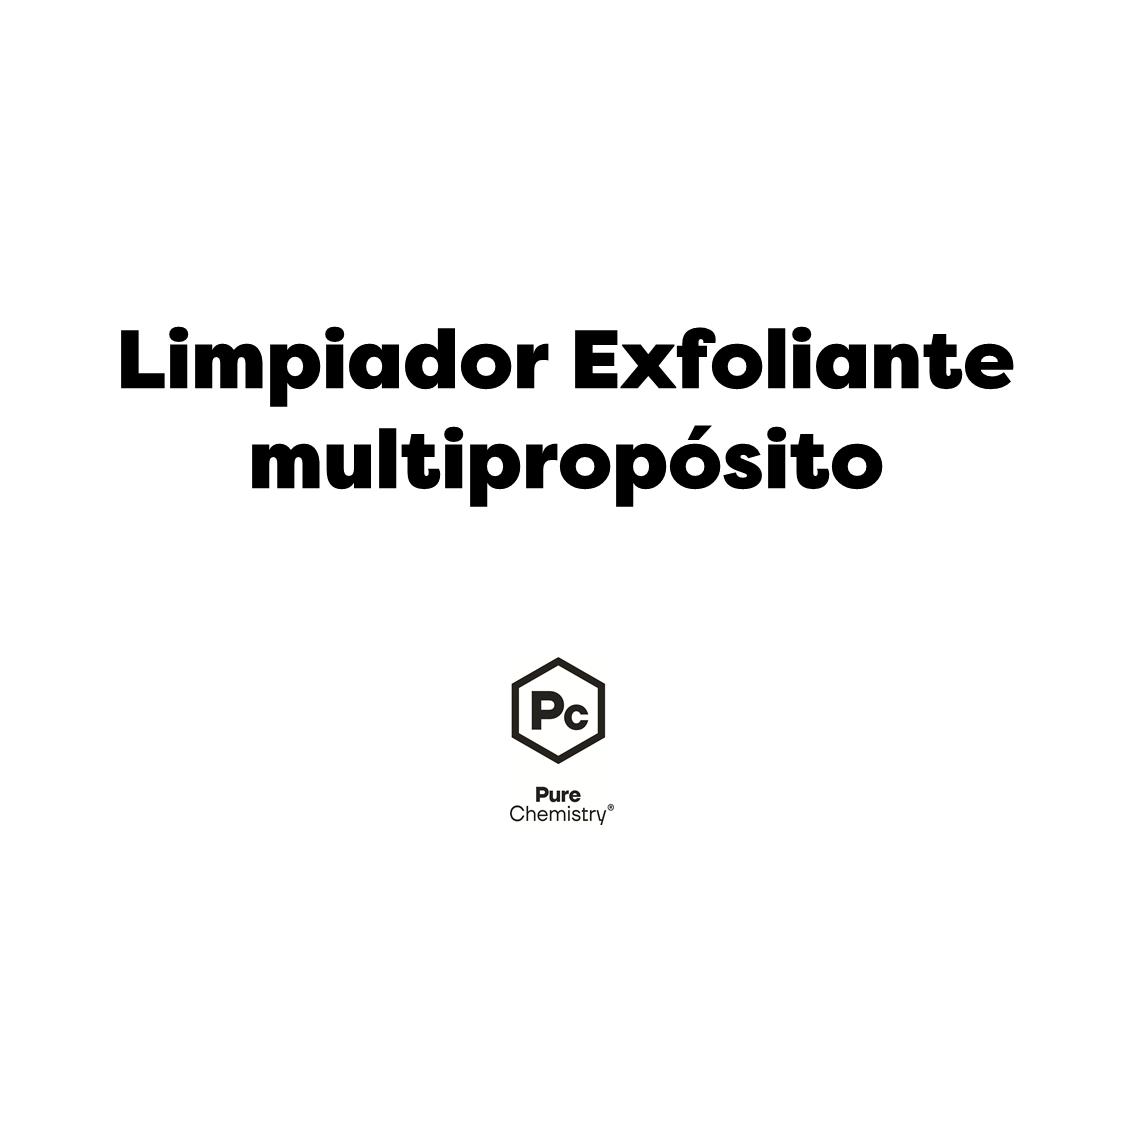 Limpiador Exfoliante Multipropósito- COSMOS ORGANIC ✅